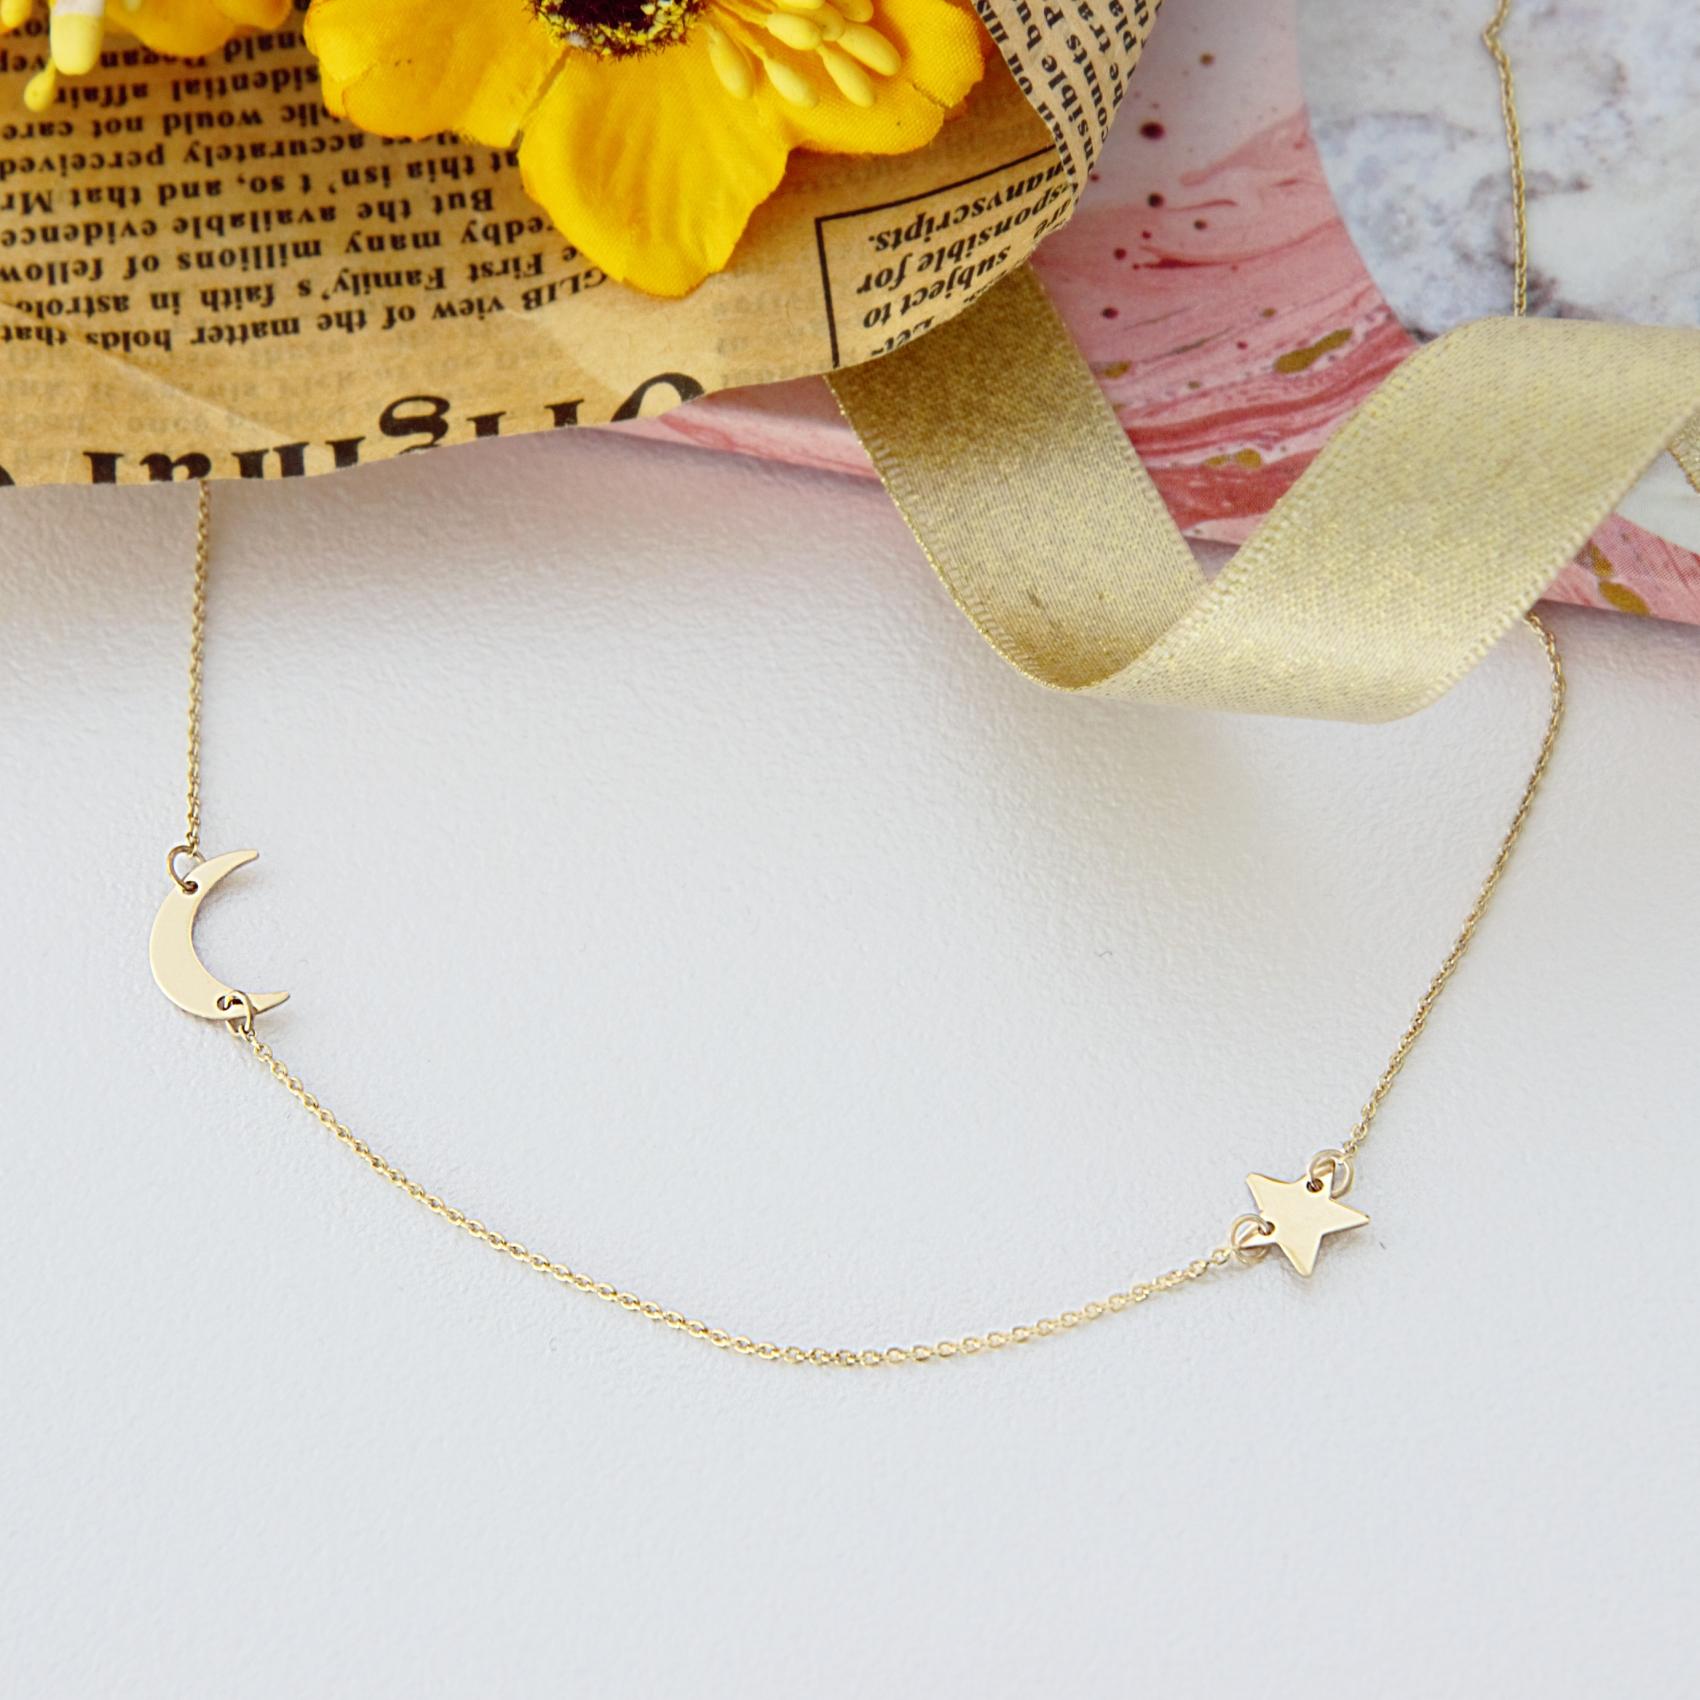 Colier cu steluta si semiluna din aur galben, alb sau roz de 14K